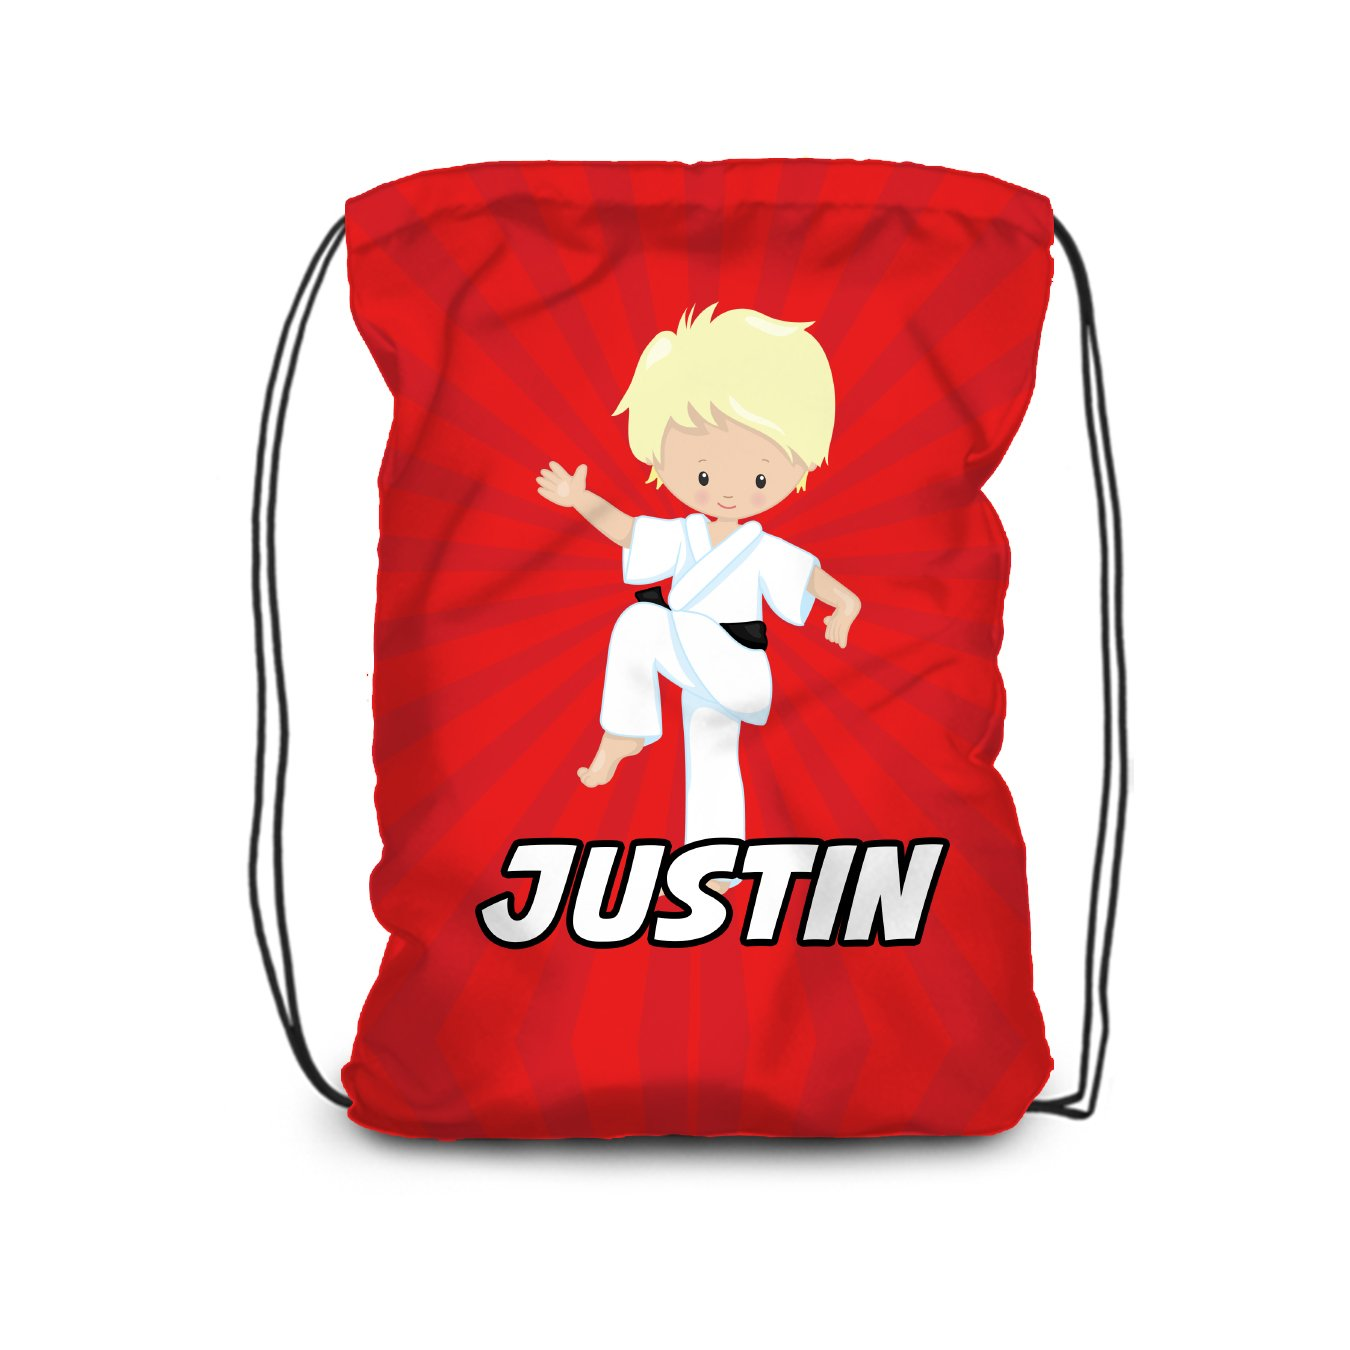 Karate Drawstring Backpack - Red Karate Boy Personalized Name Bag